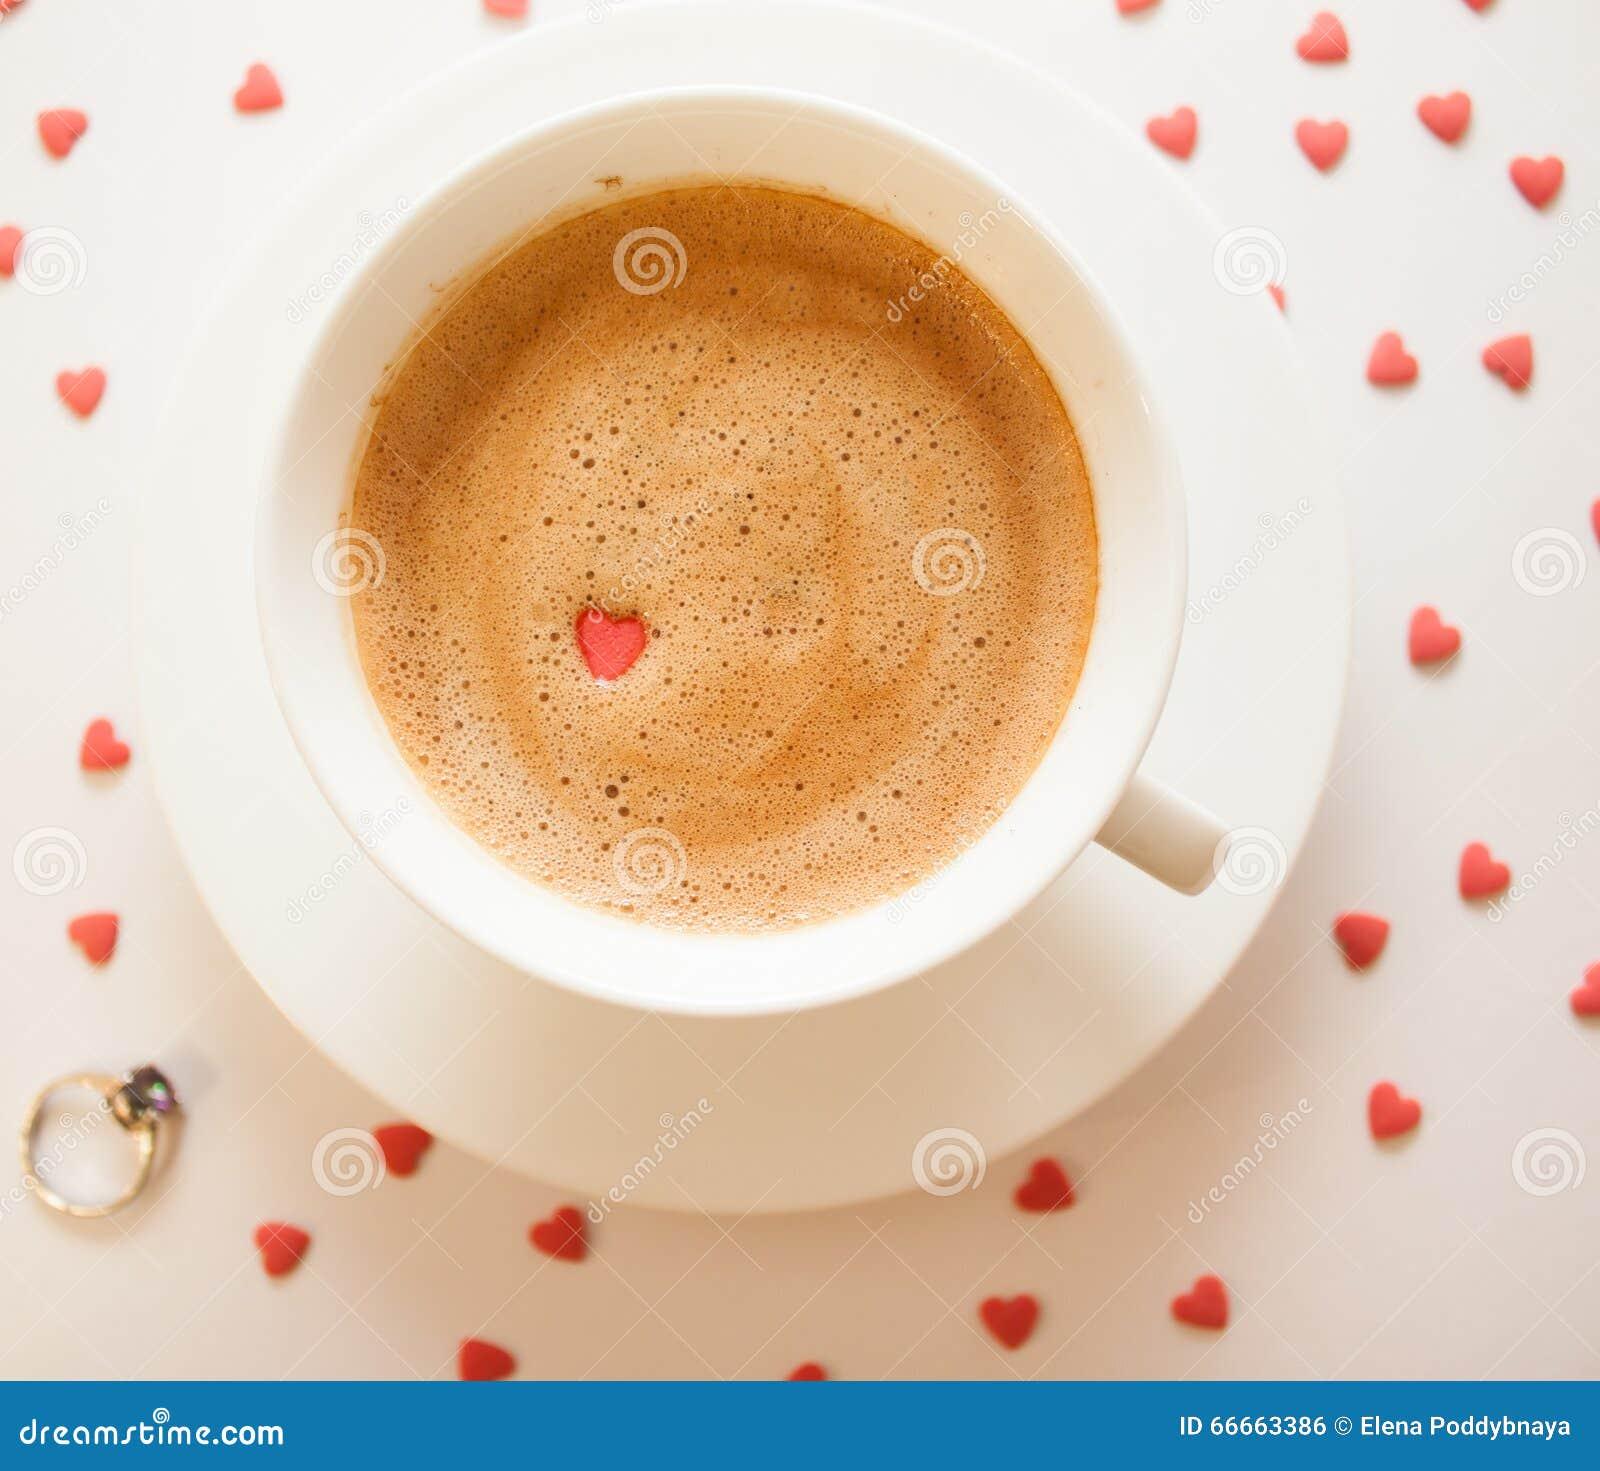 Guten morgen verliebt